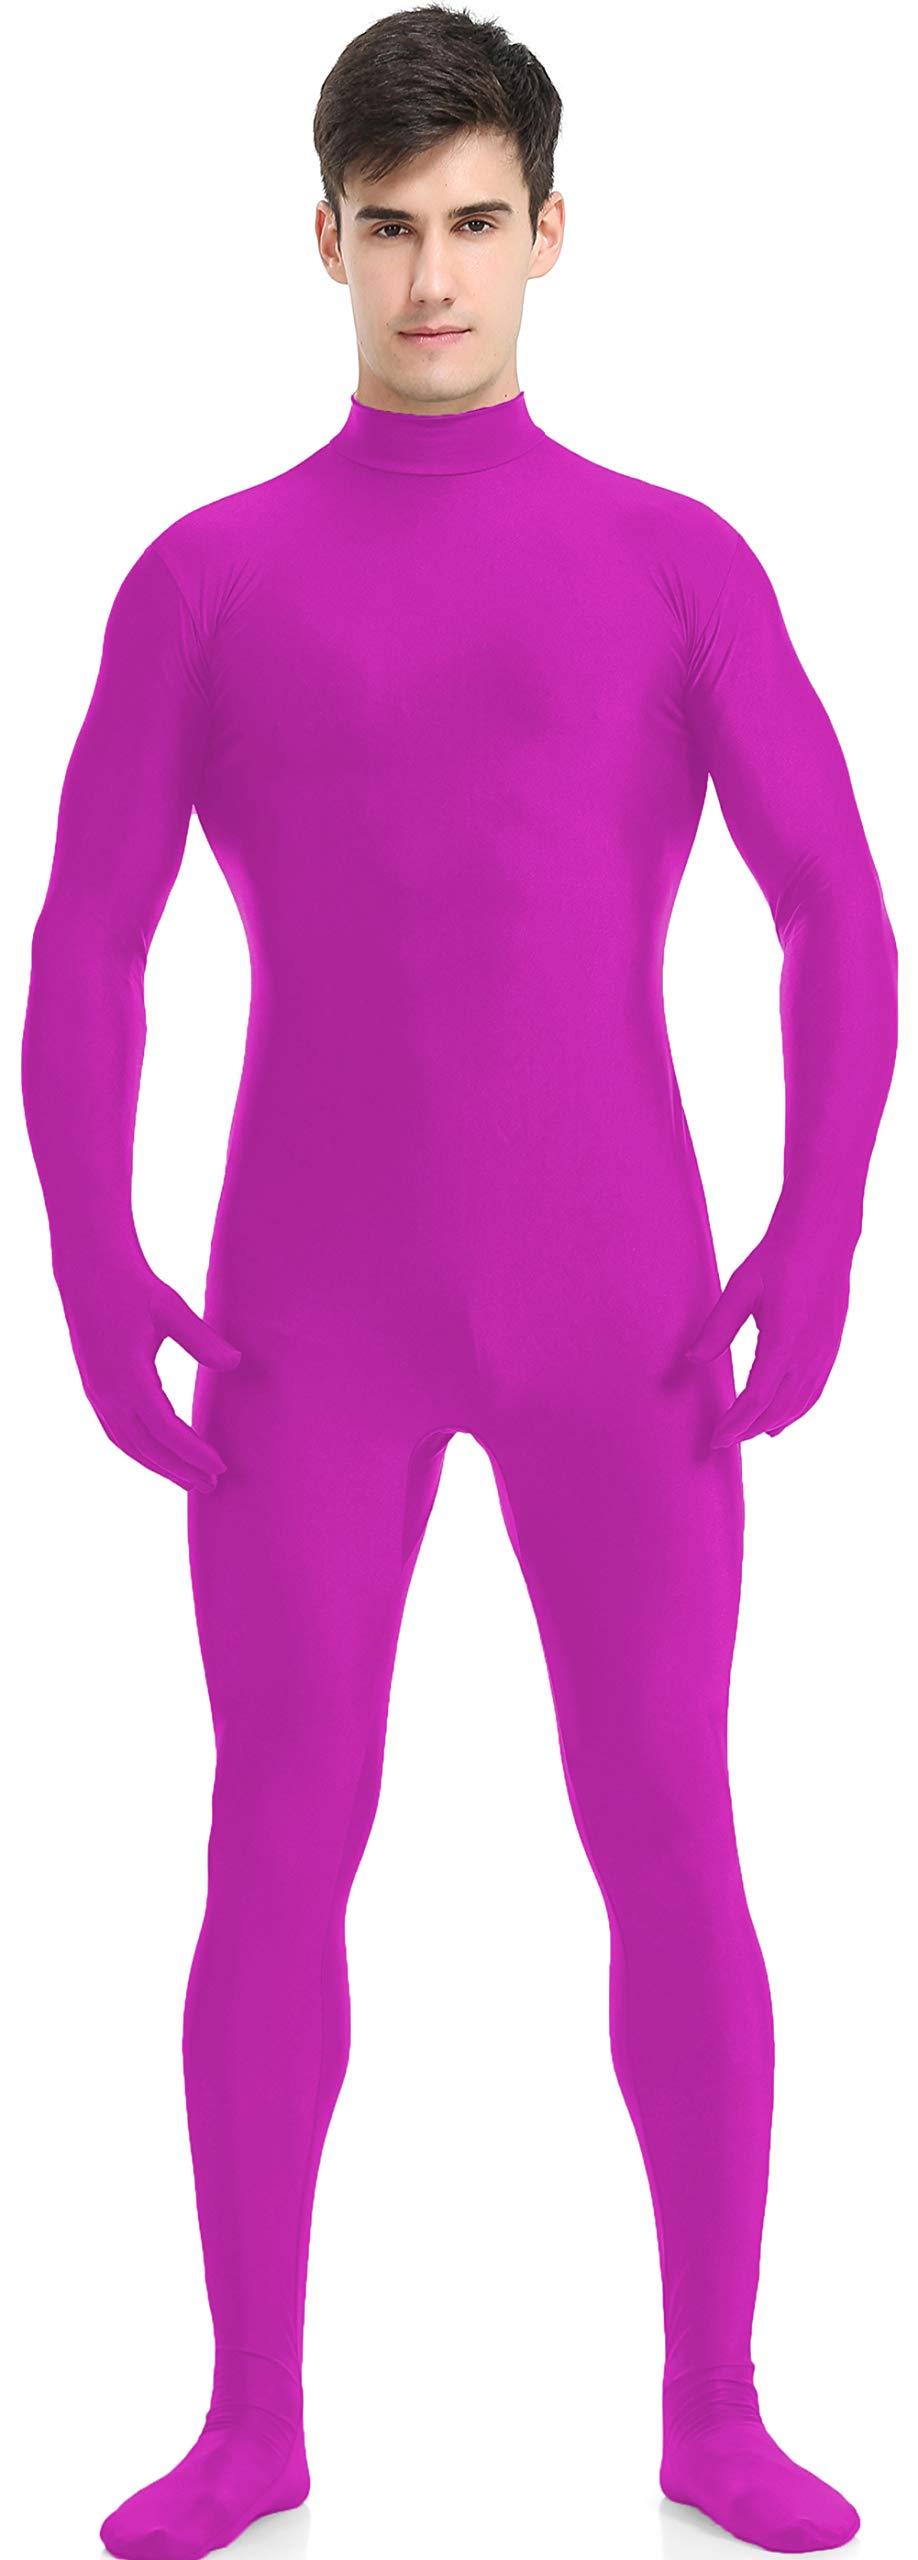 speerise Adult Full Lycra Spandex Bodysuit Unitard Costume Zentai Suit Without Hood, Fuchsia, XXXL by speerise